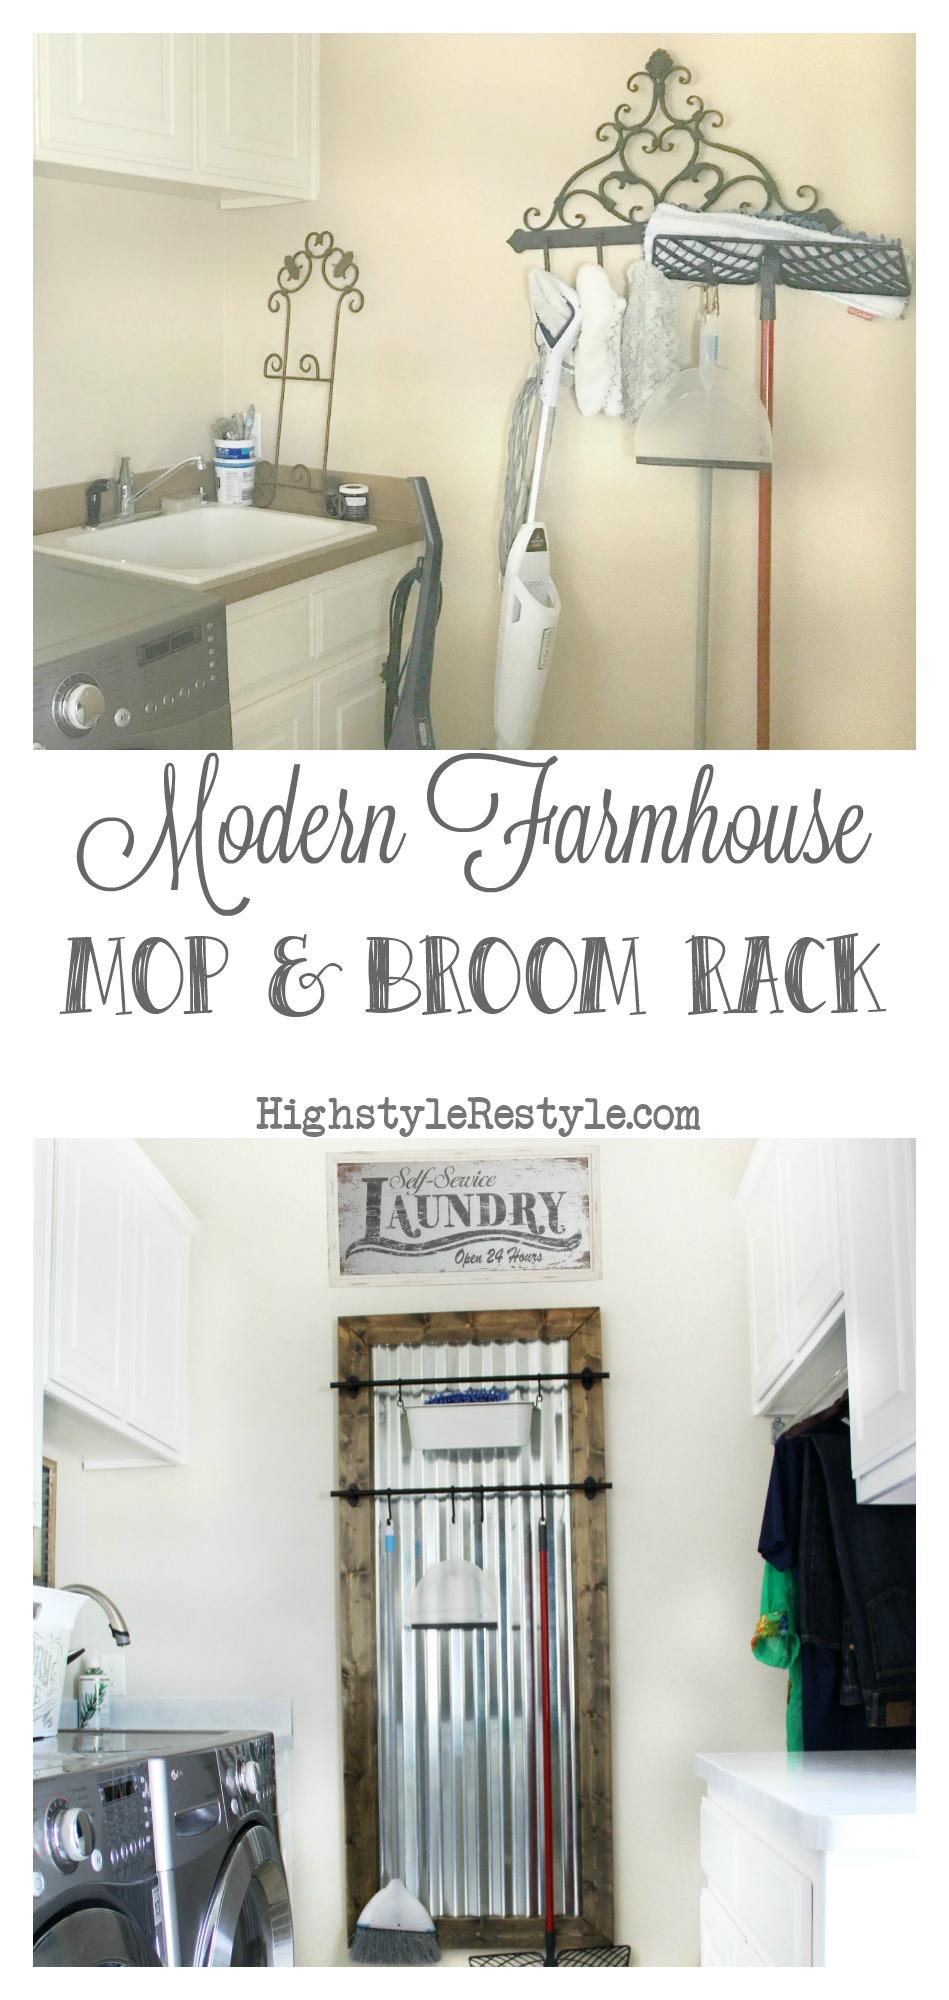 Modern Farmhouse Mop Broom Rack.jpg